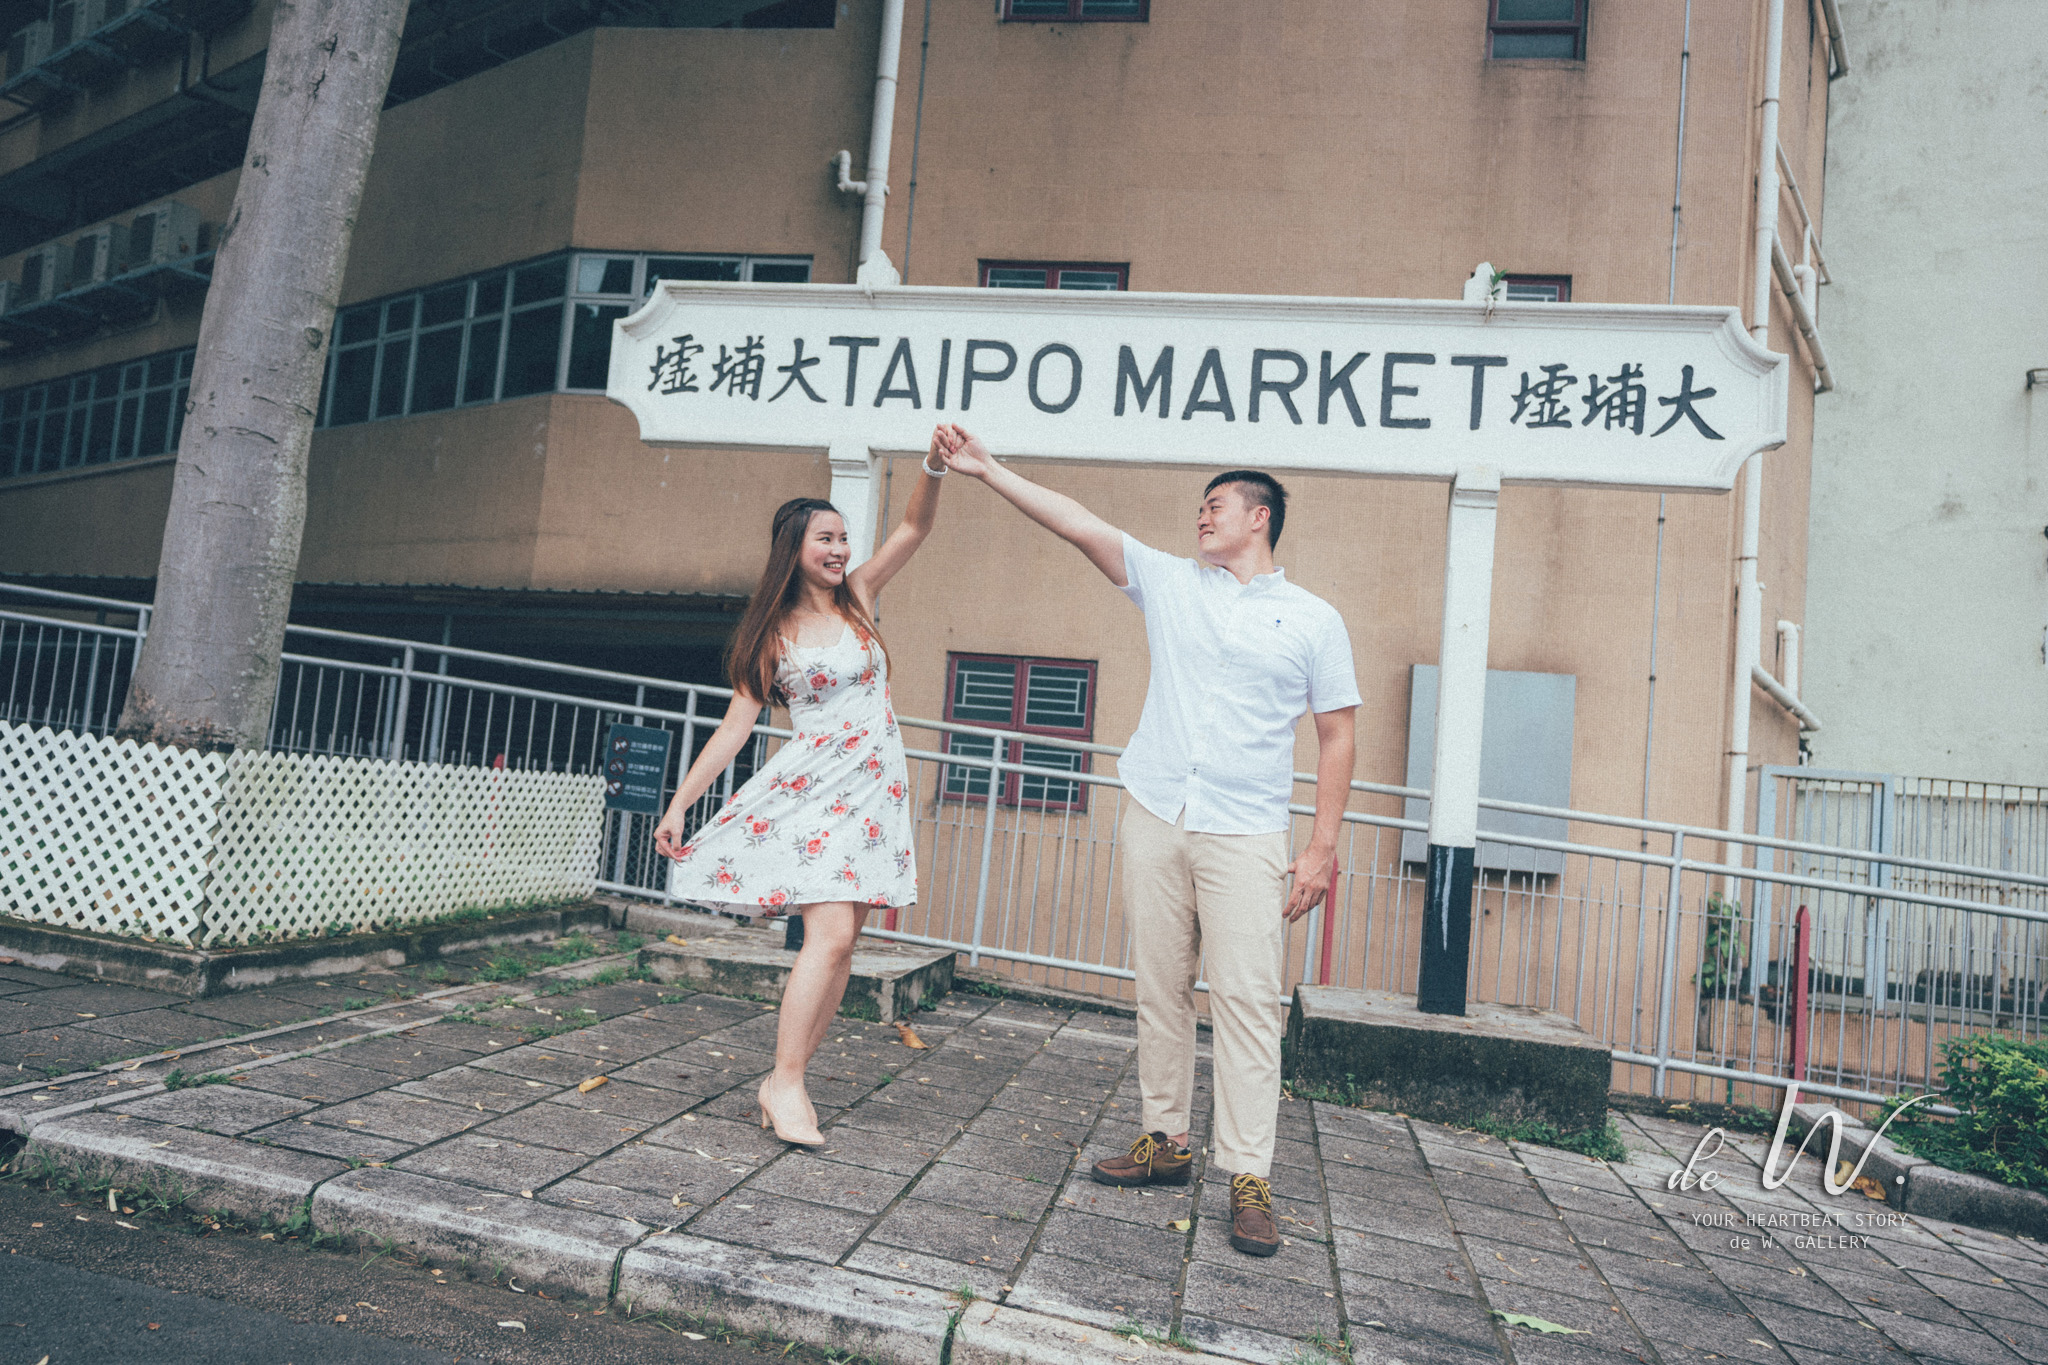 film style story teller de w gallery top10 destination wedding 大埔 火車 2048-021